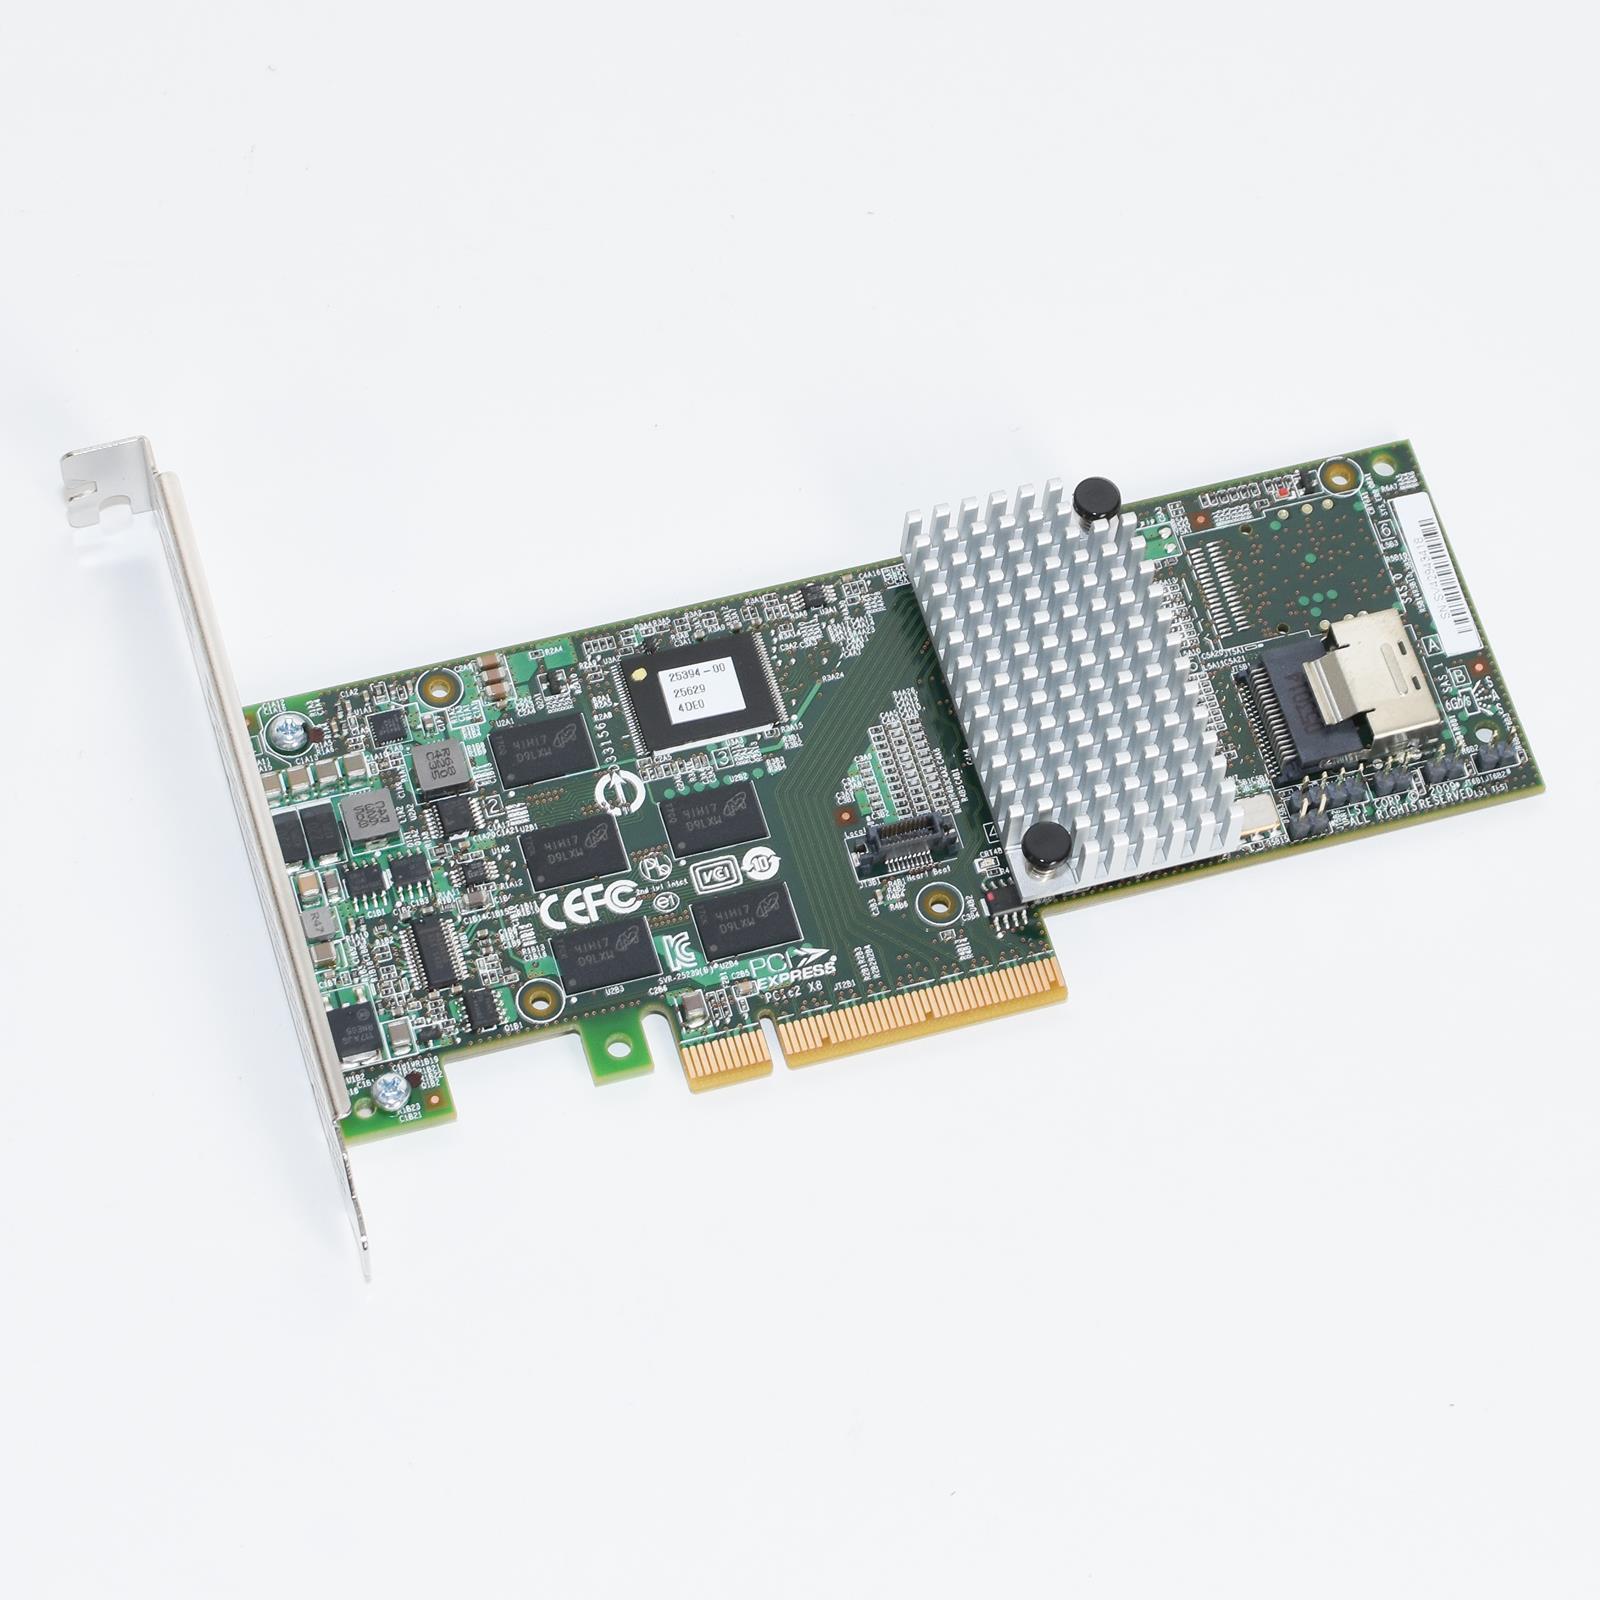 Details about LSI 3Ware 9750-4i 4-Port Internal SATA/SAS 6Gbps PCI-e 2 0  RAID Controller Card